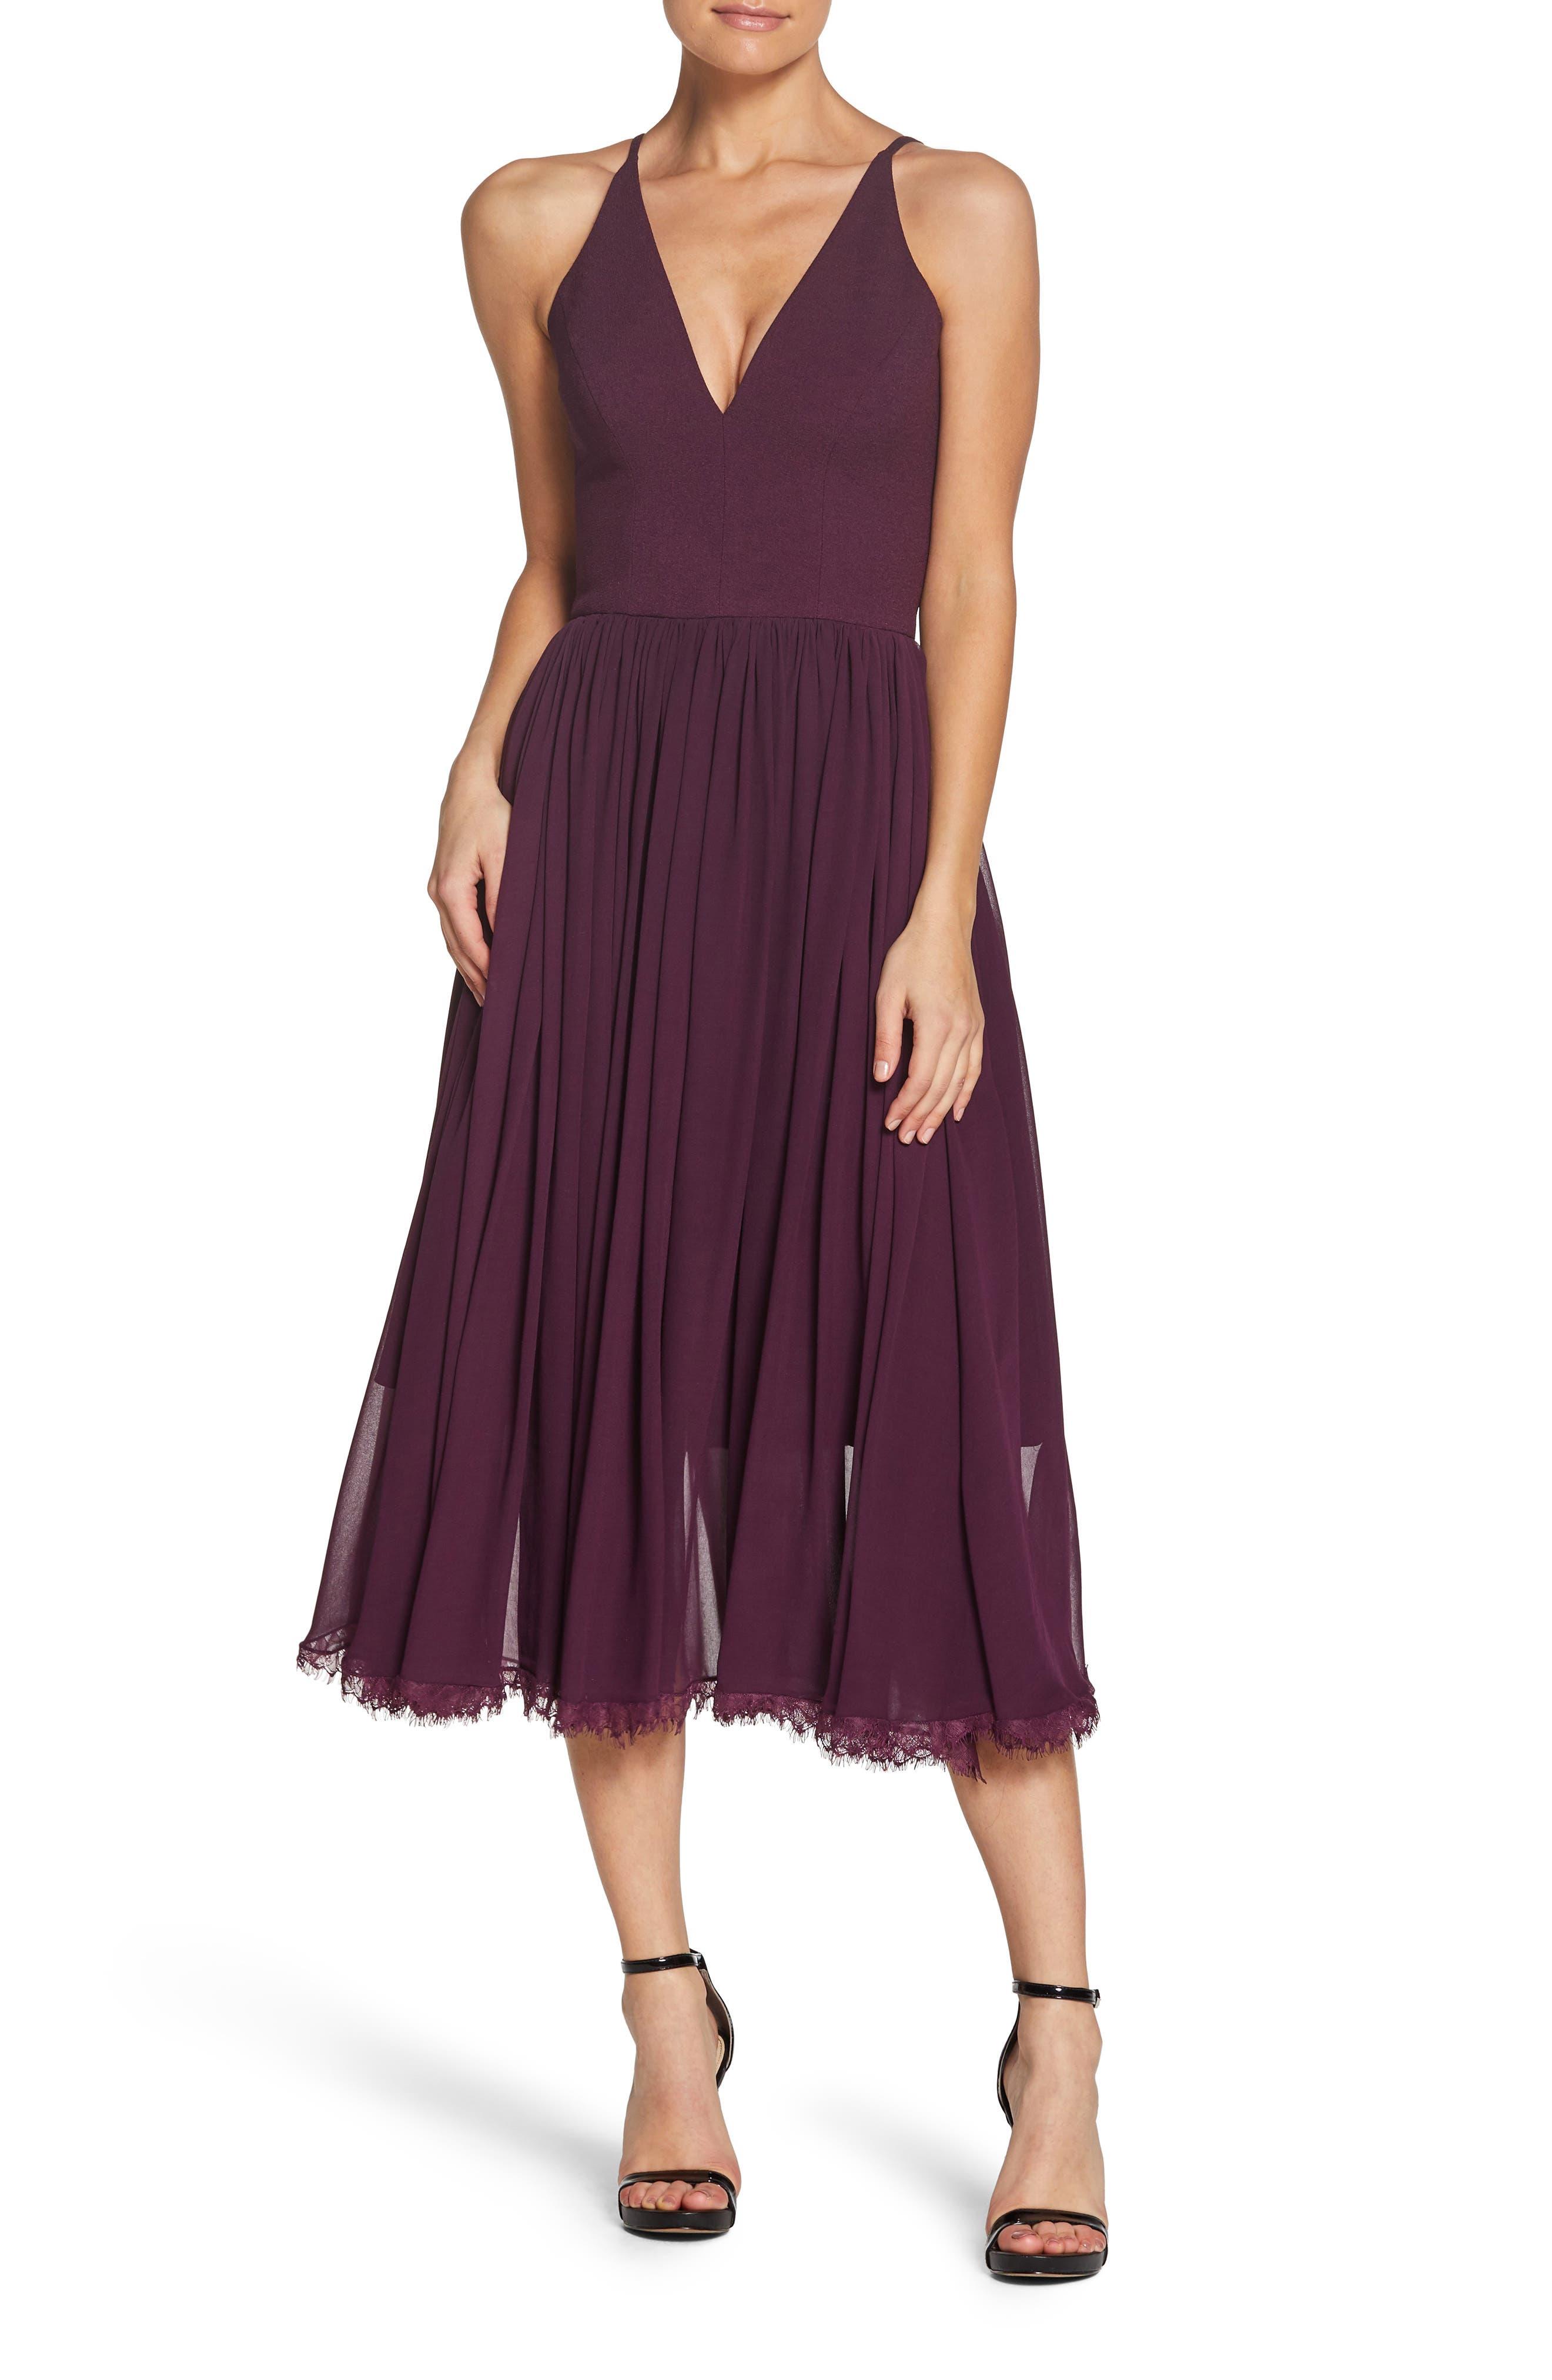 Alicia Mixed Media Midi Dress, Main, color, PLUM